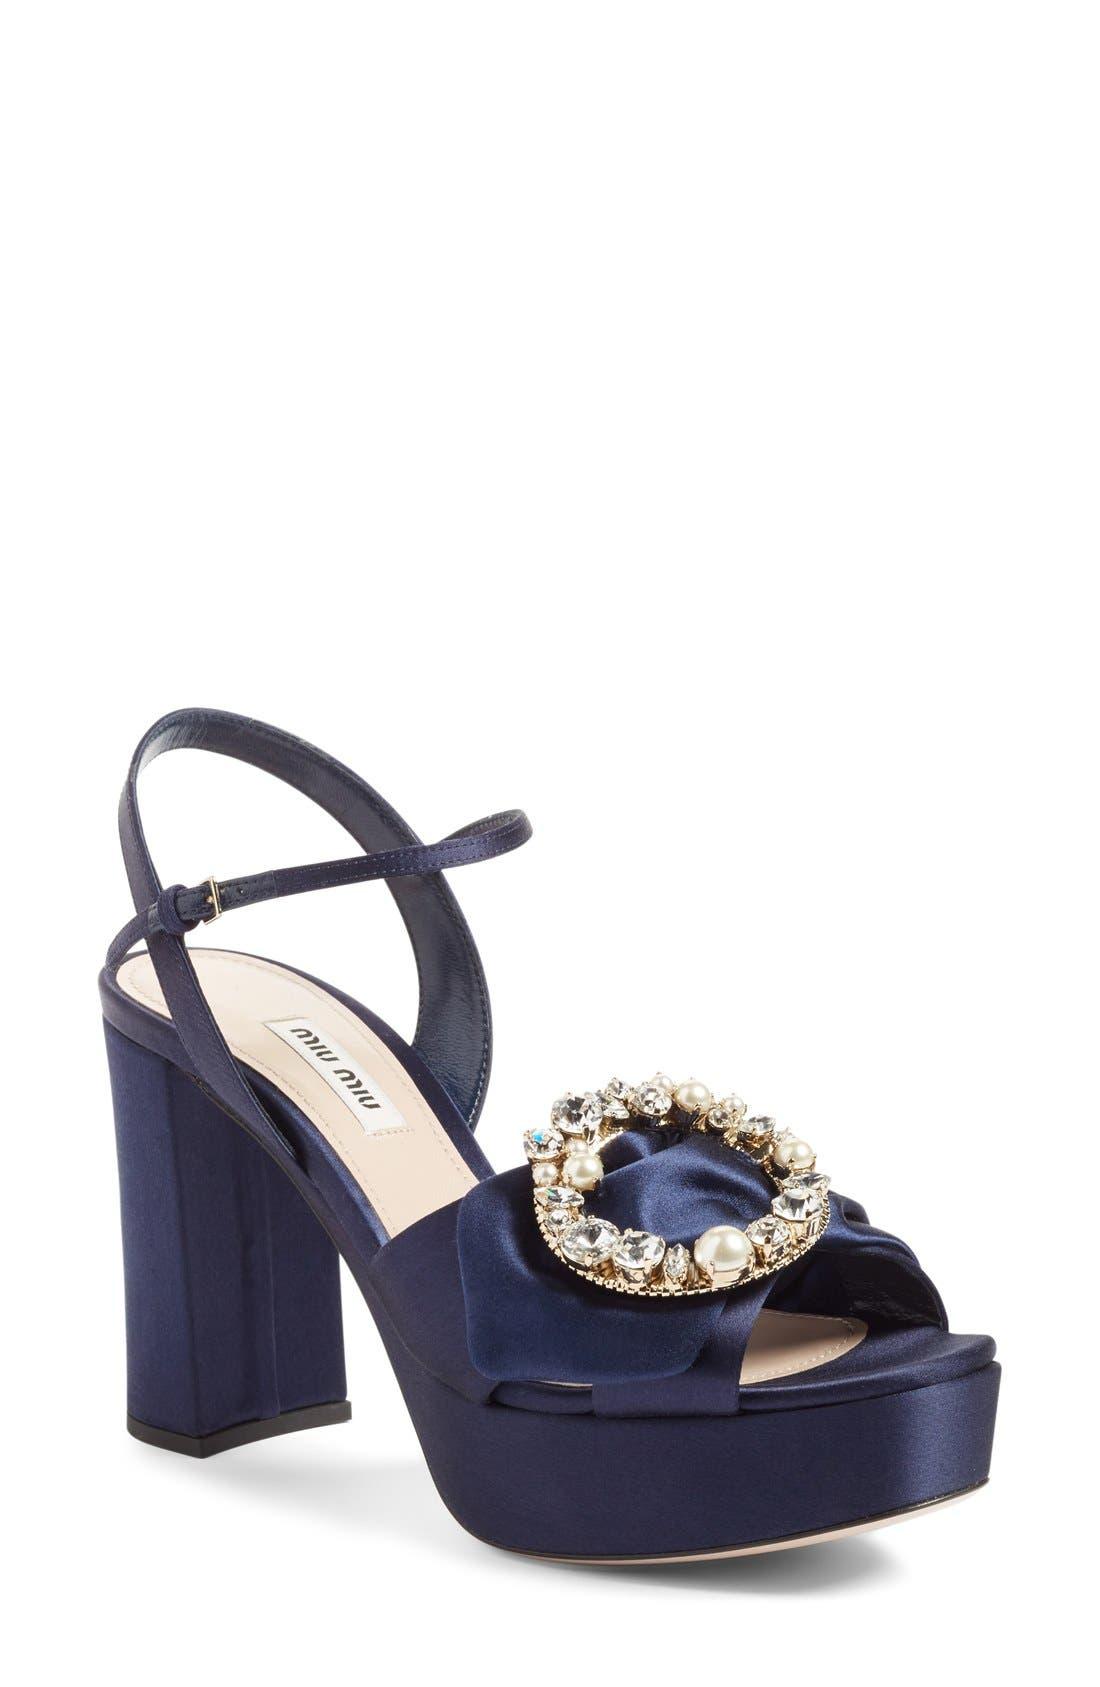 Alternate Image 1 Selected - Miu Miu Embellished Buckle Platform Sandal (Women)